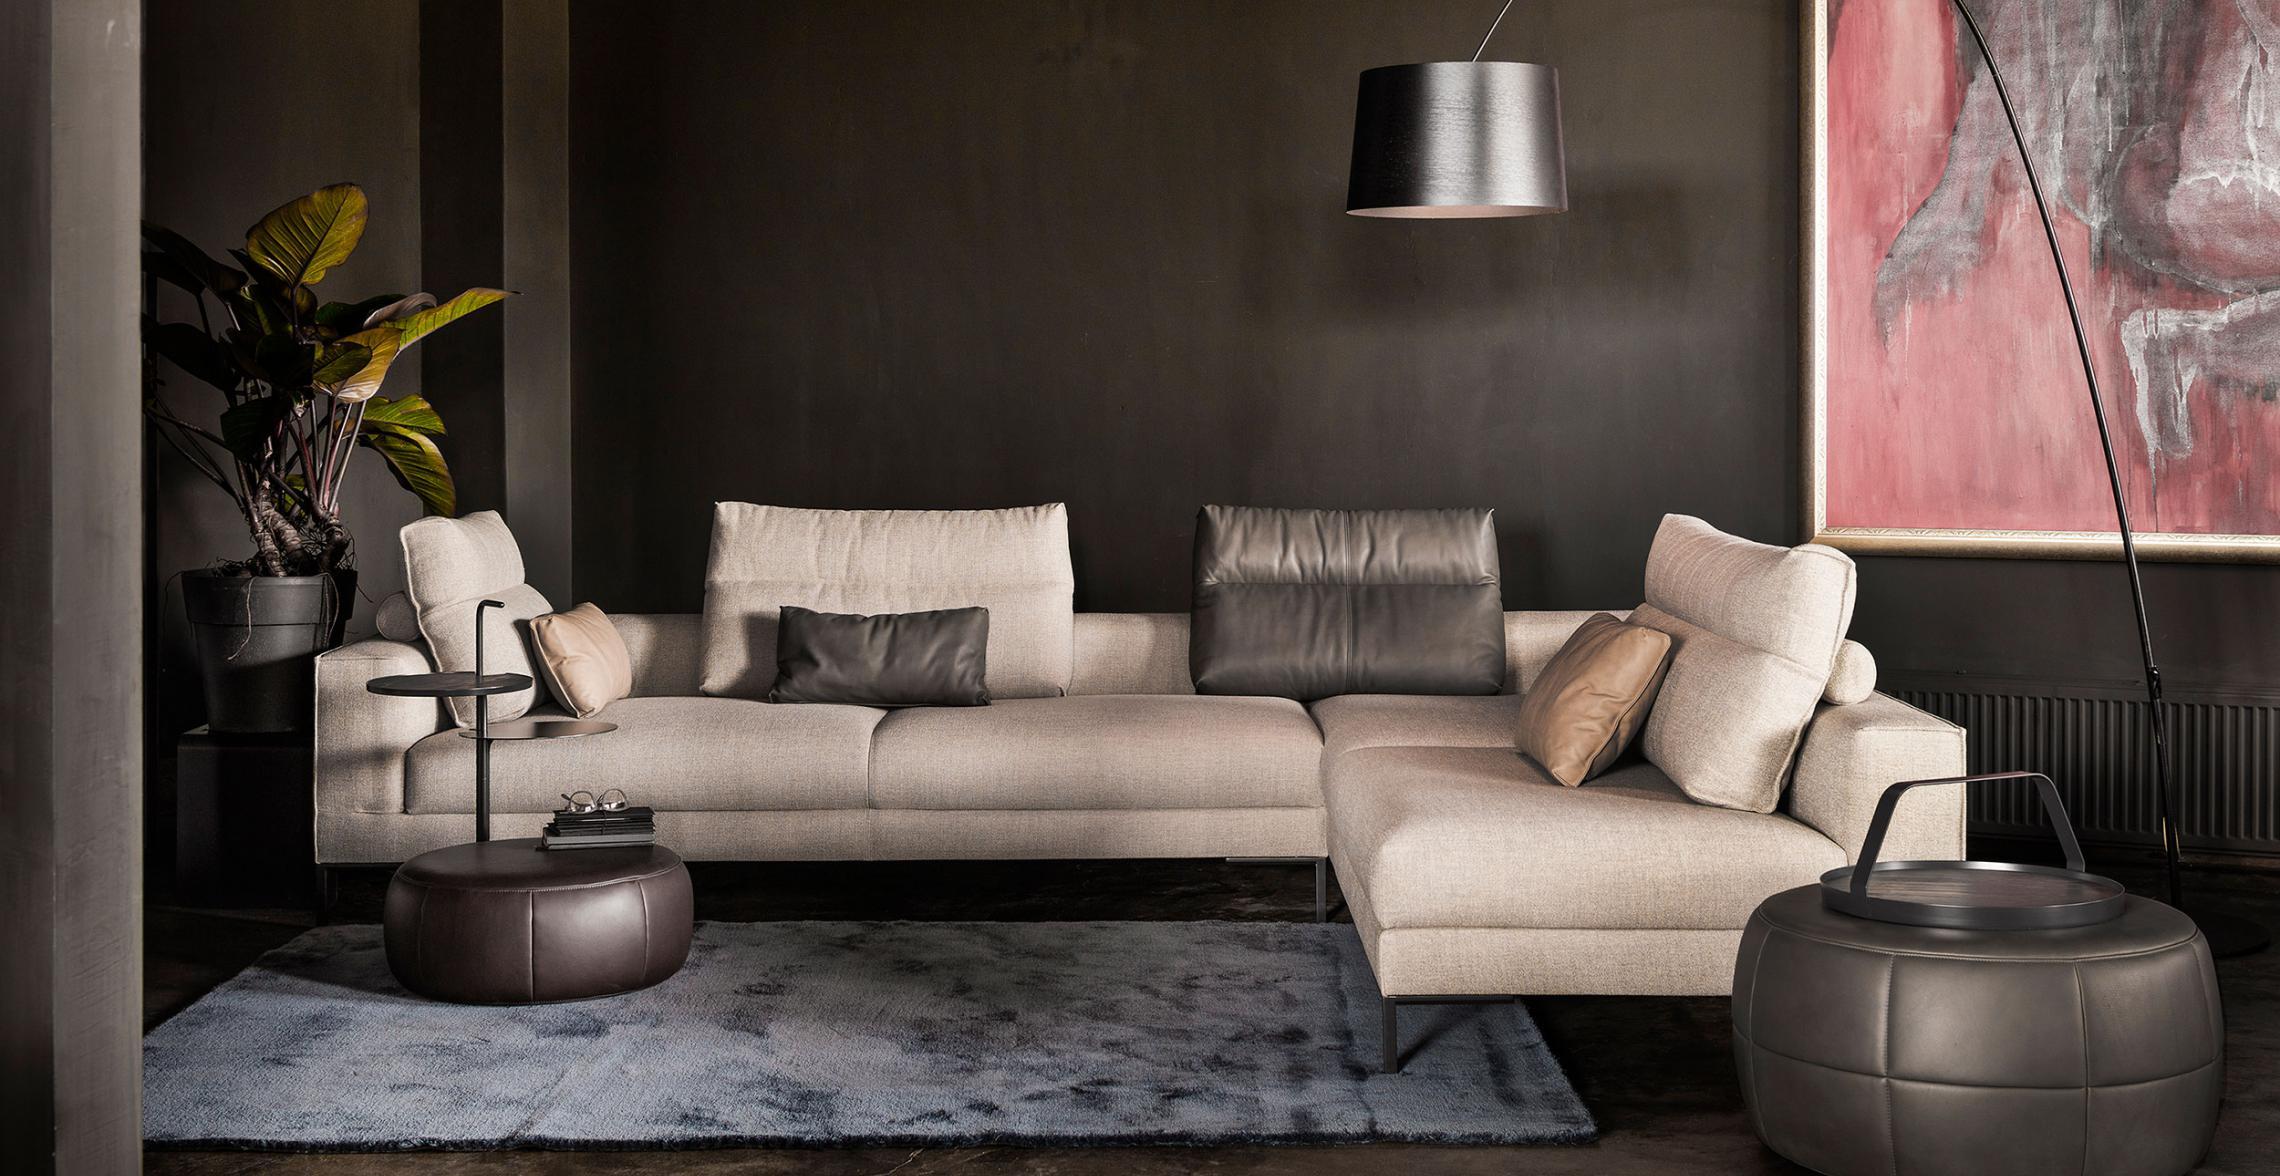 Design meubelen interieur plus peer design eetkamers salons for Home design interieur